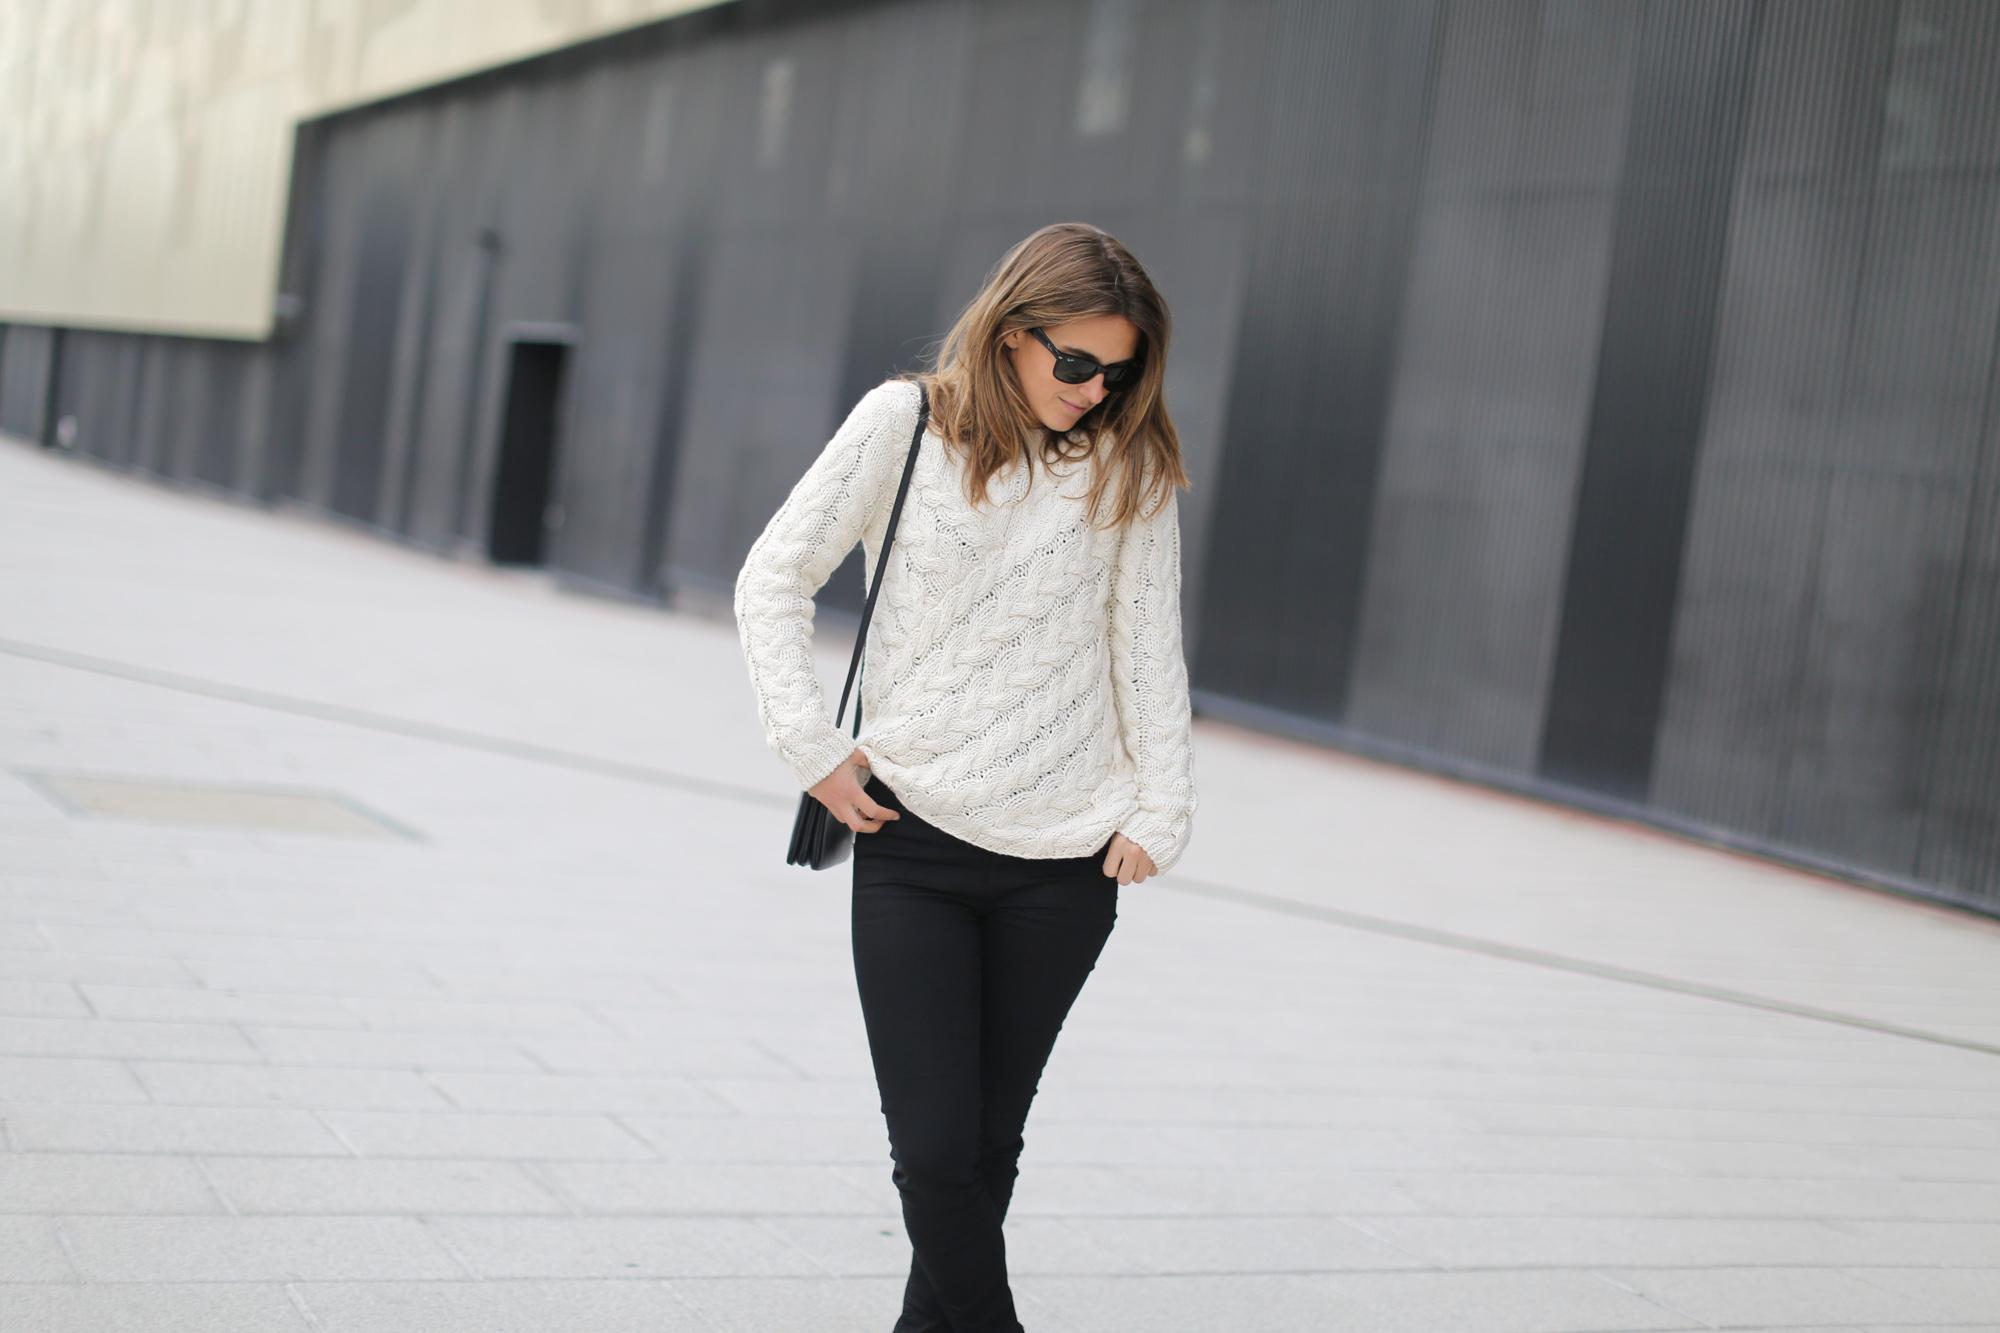 Clochet-streetstyle-isabel-marant-ellison-parka-h&m-trend-shirt-12